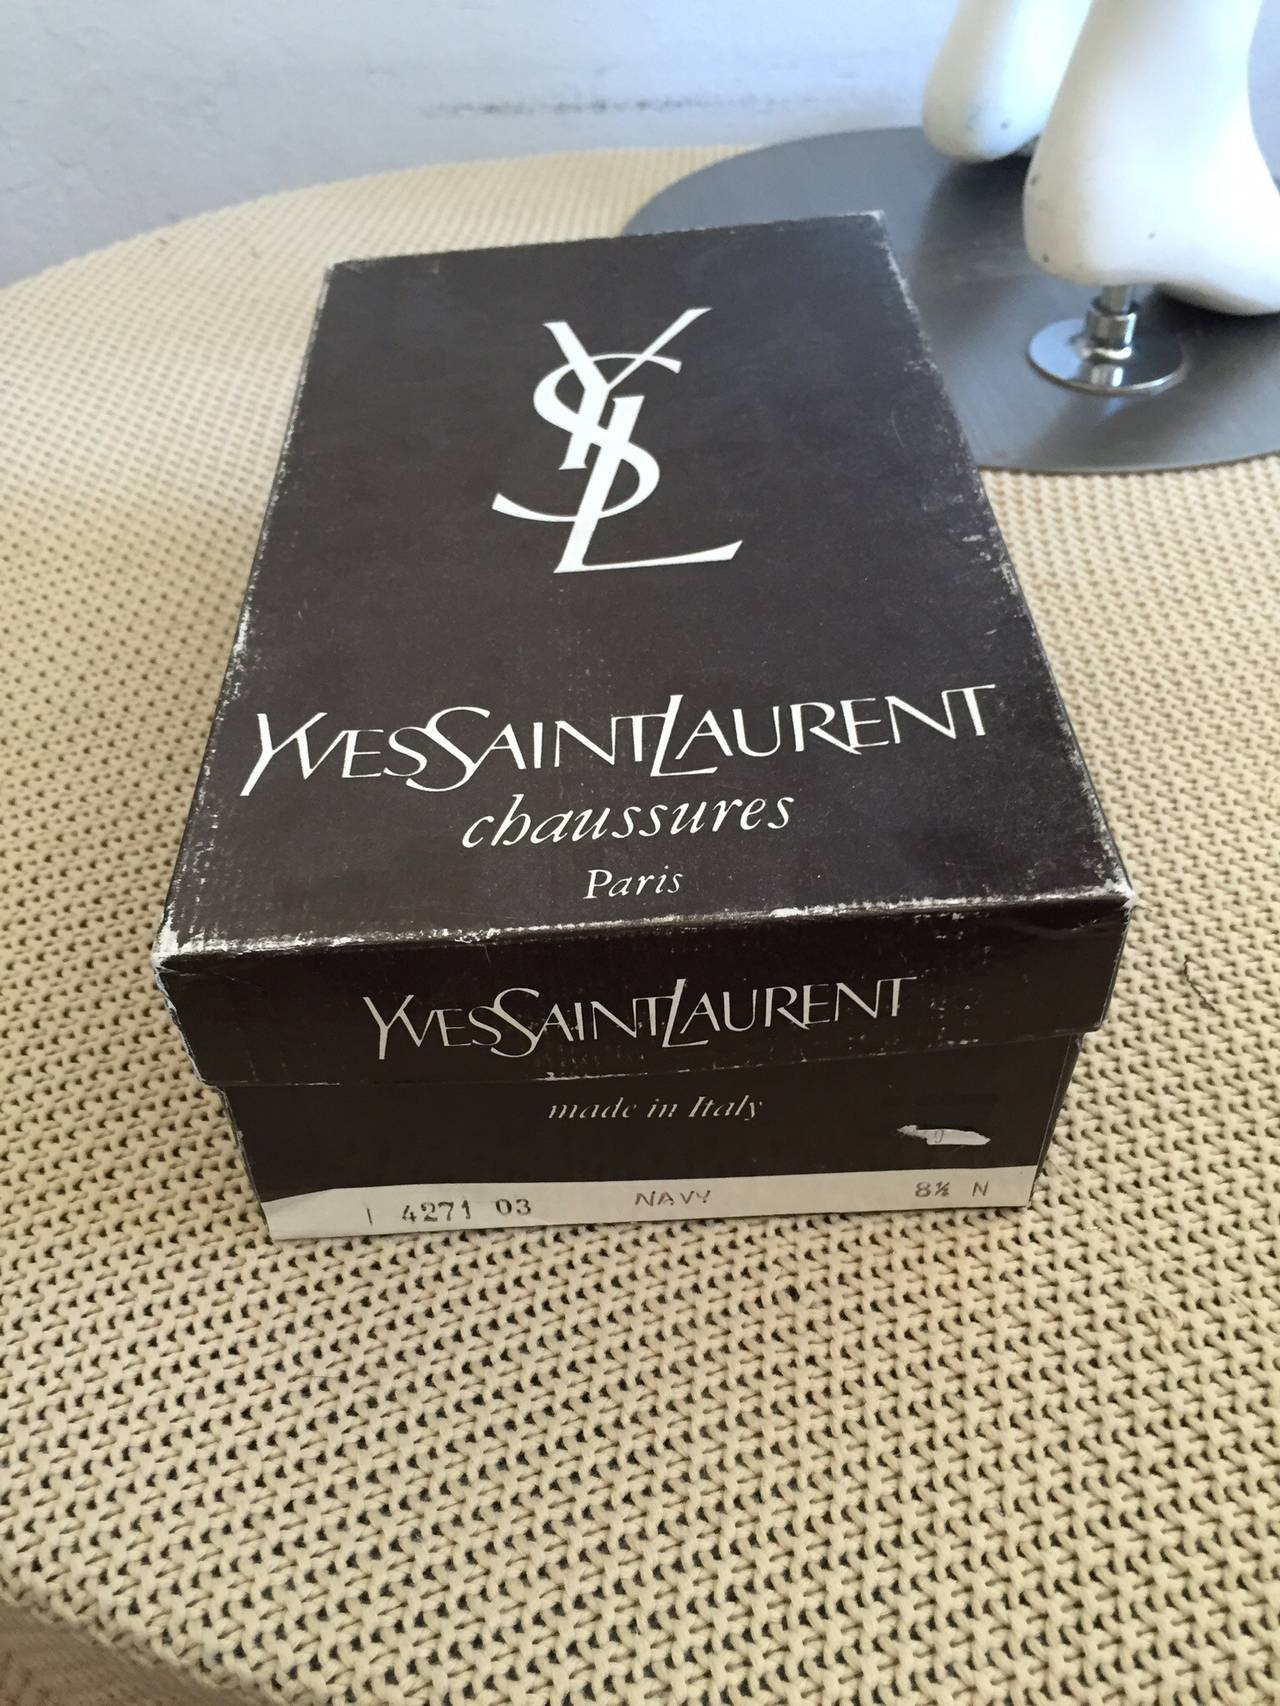 Yves Saint Laurent Navy Blue Avant Garde Rhinestone Vintage Heels Shoes Size 8.5 8